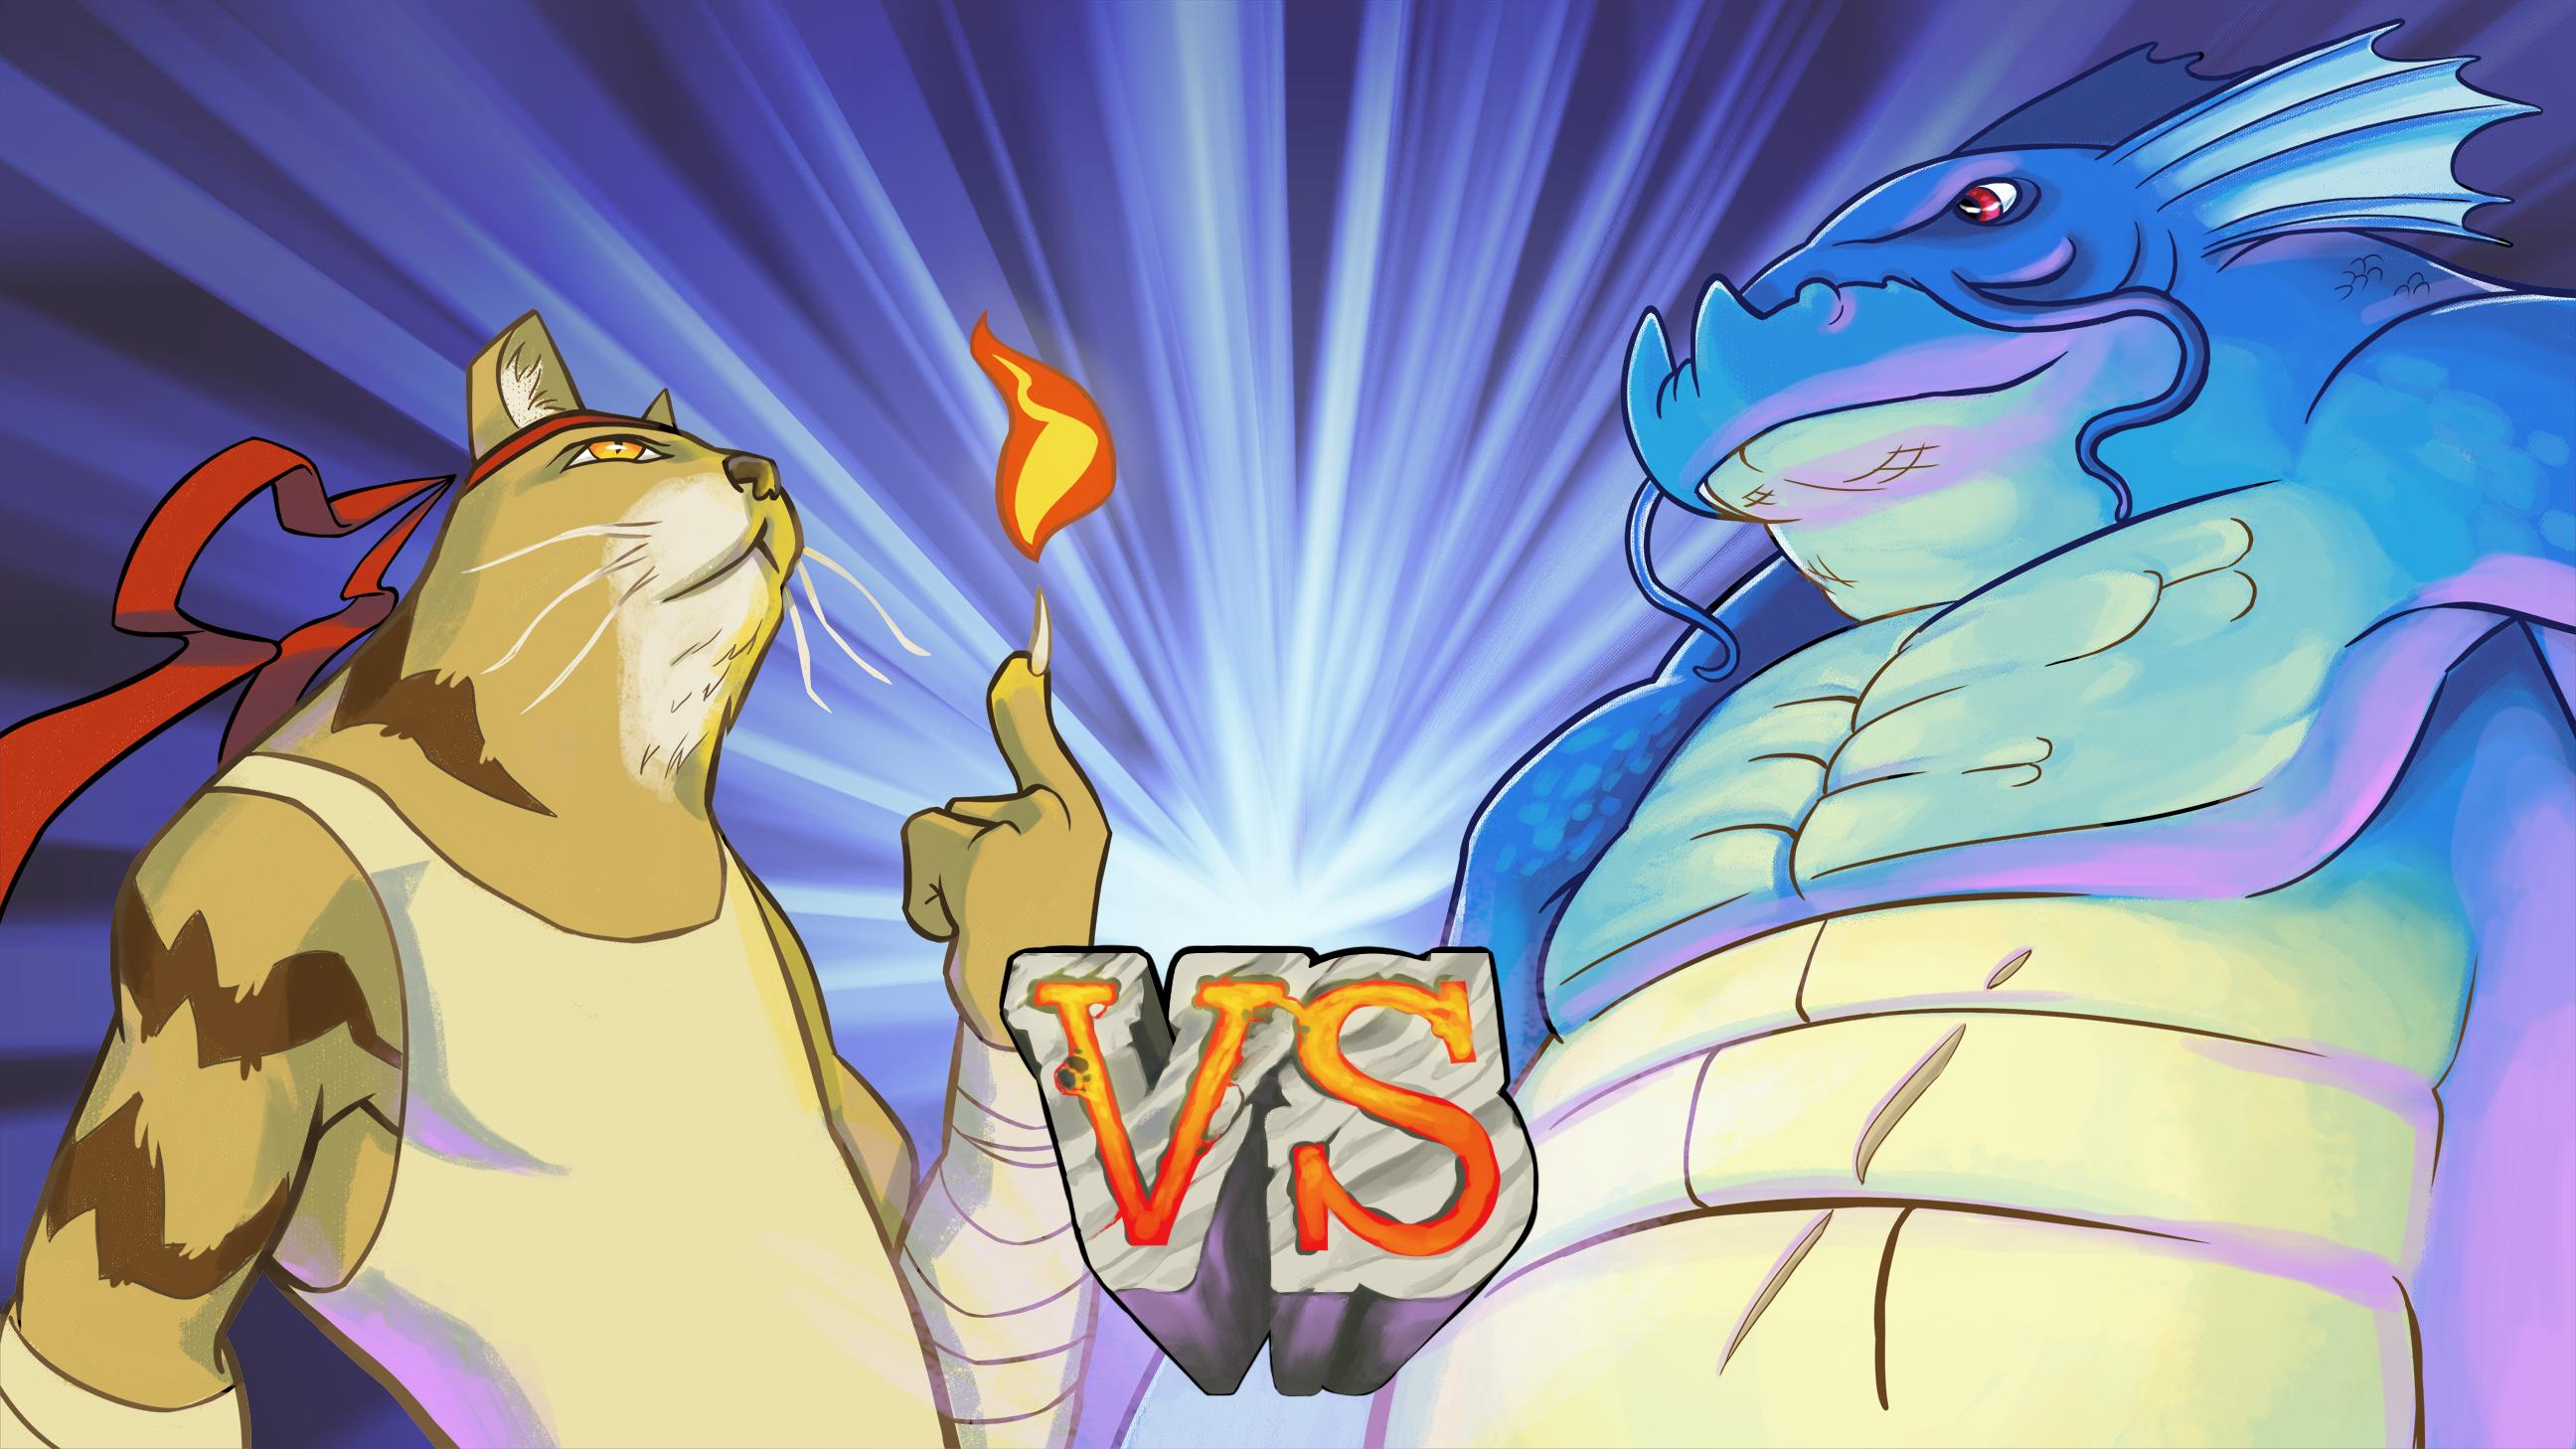 Kitten Vs Dragon.. Fight!!